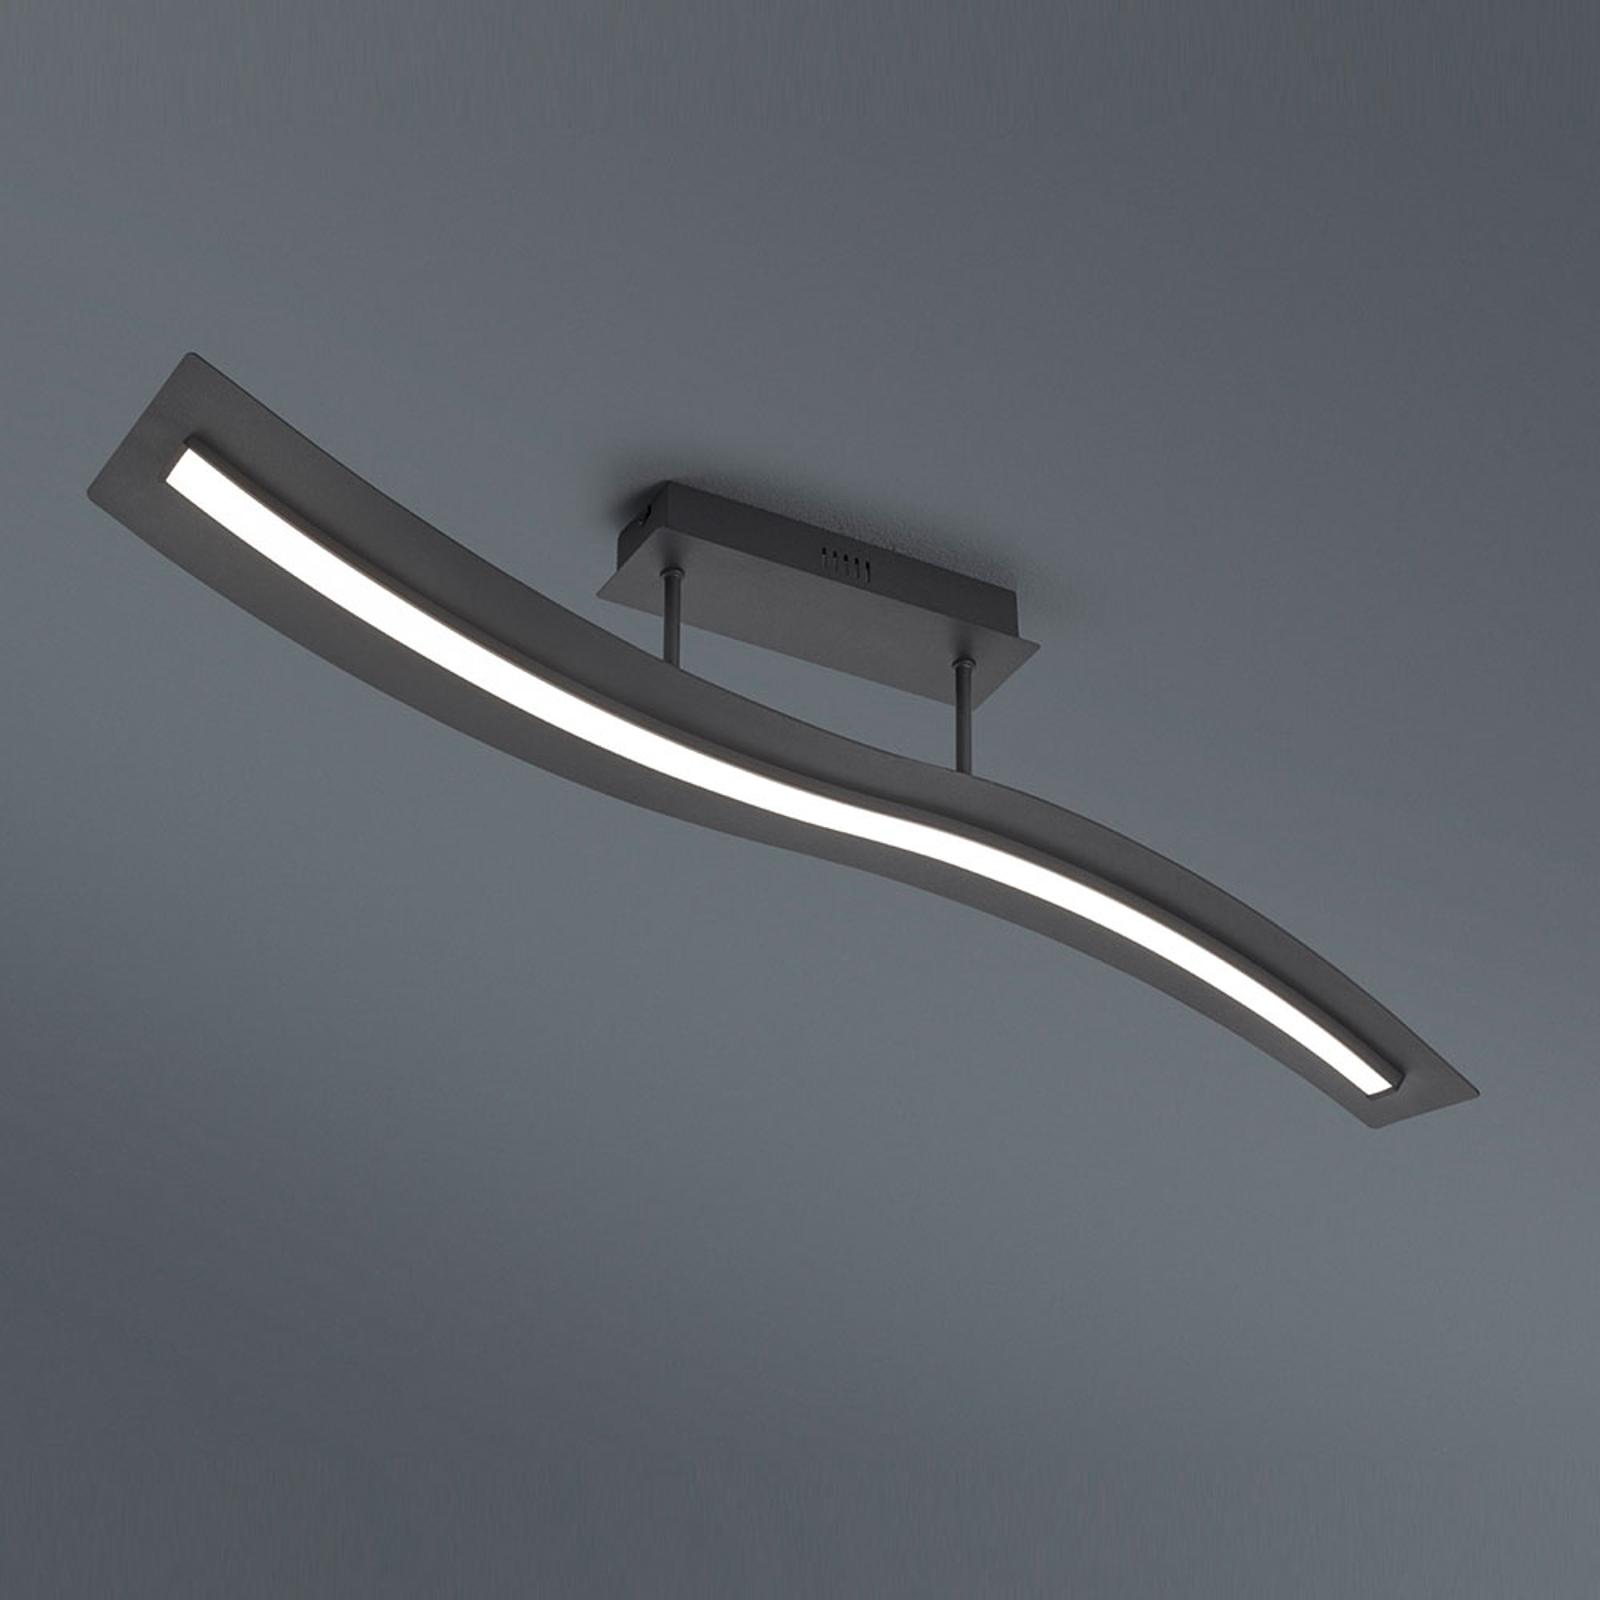 Salerno LED-loftlampe, SwitchDim, mat sort